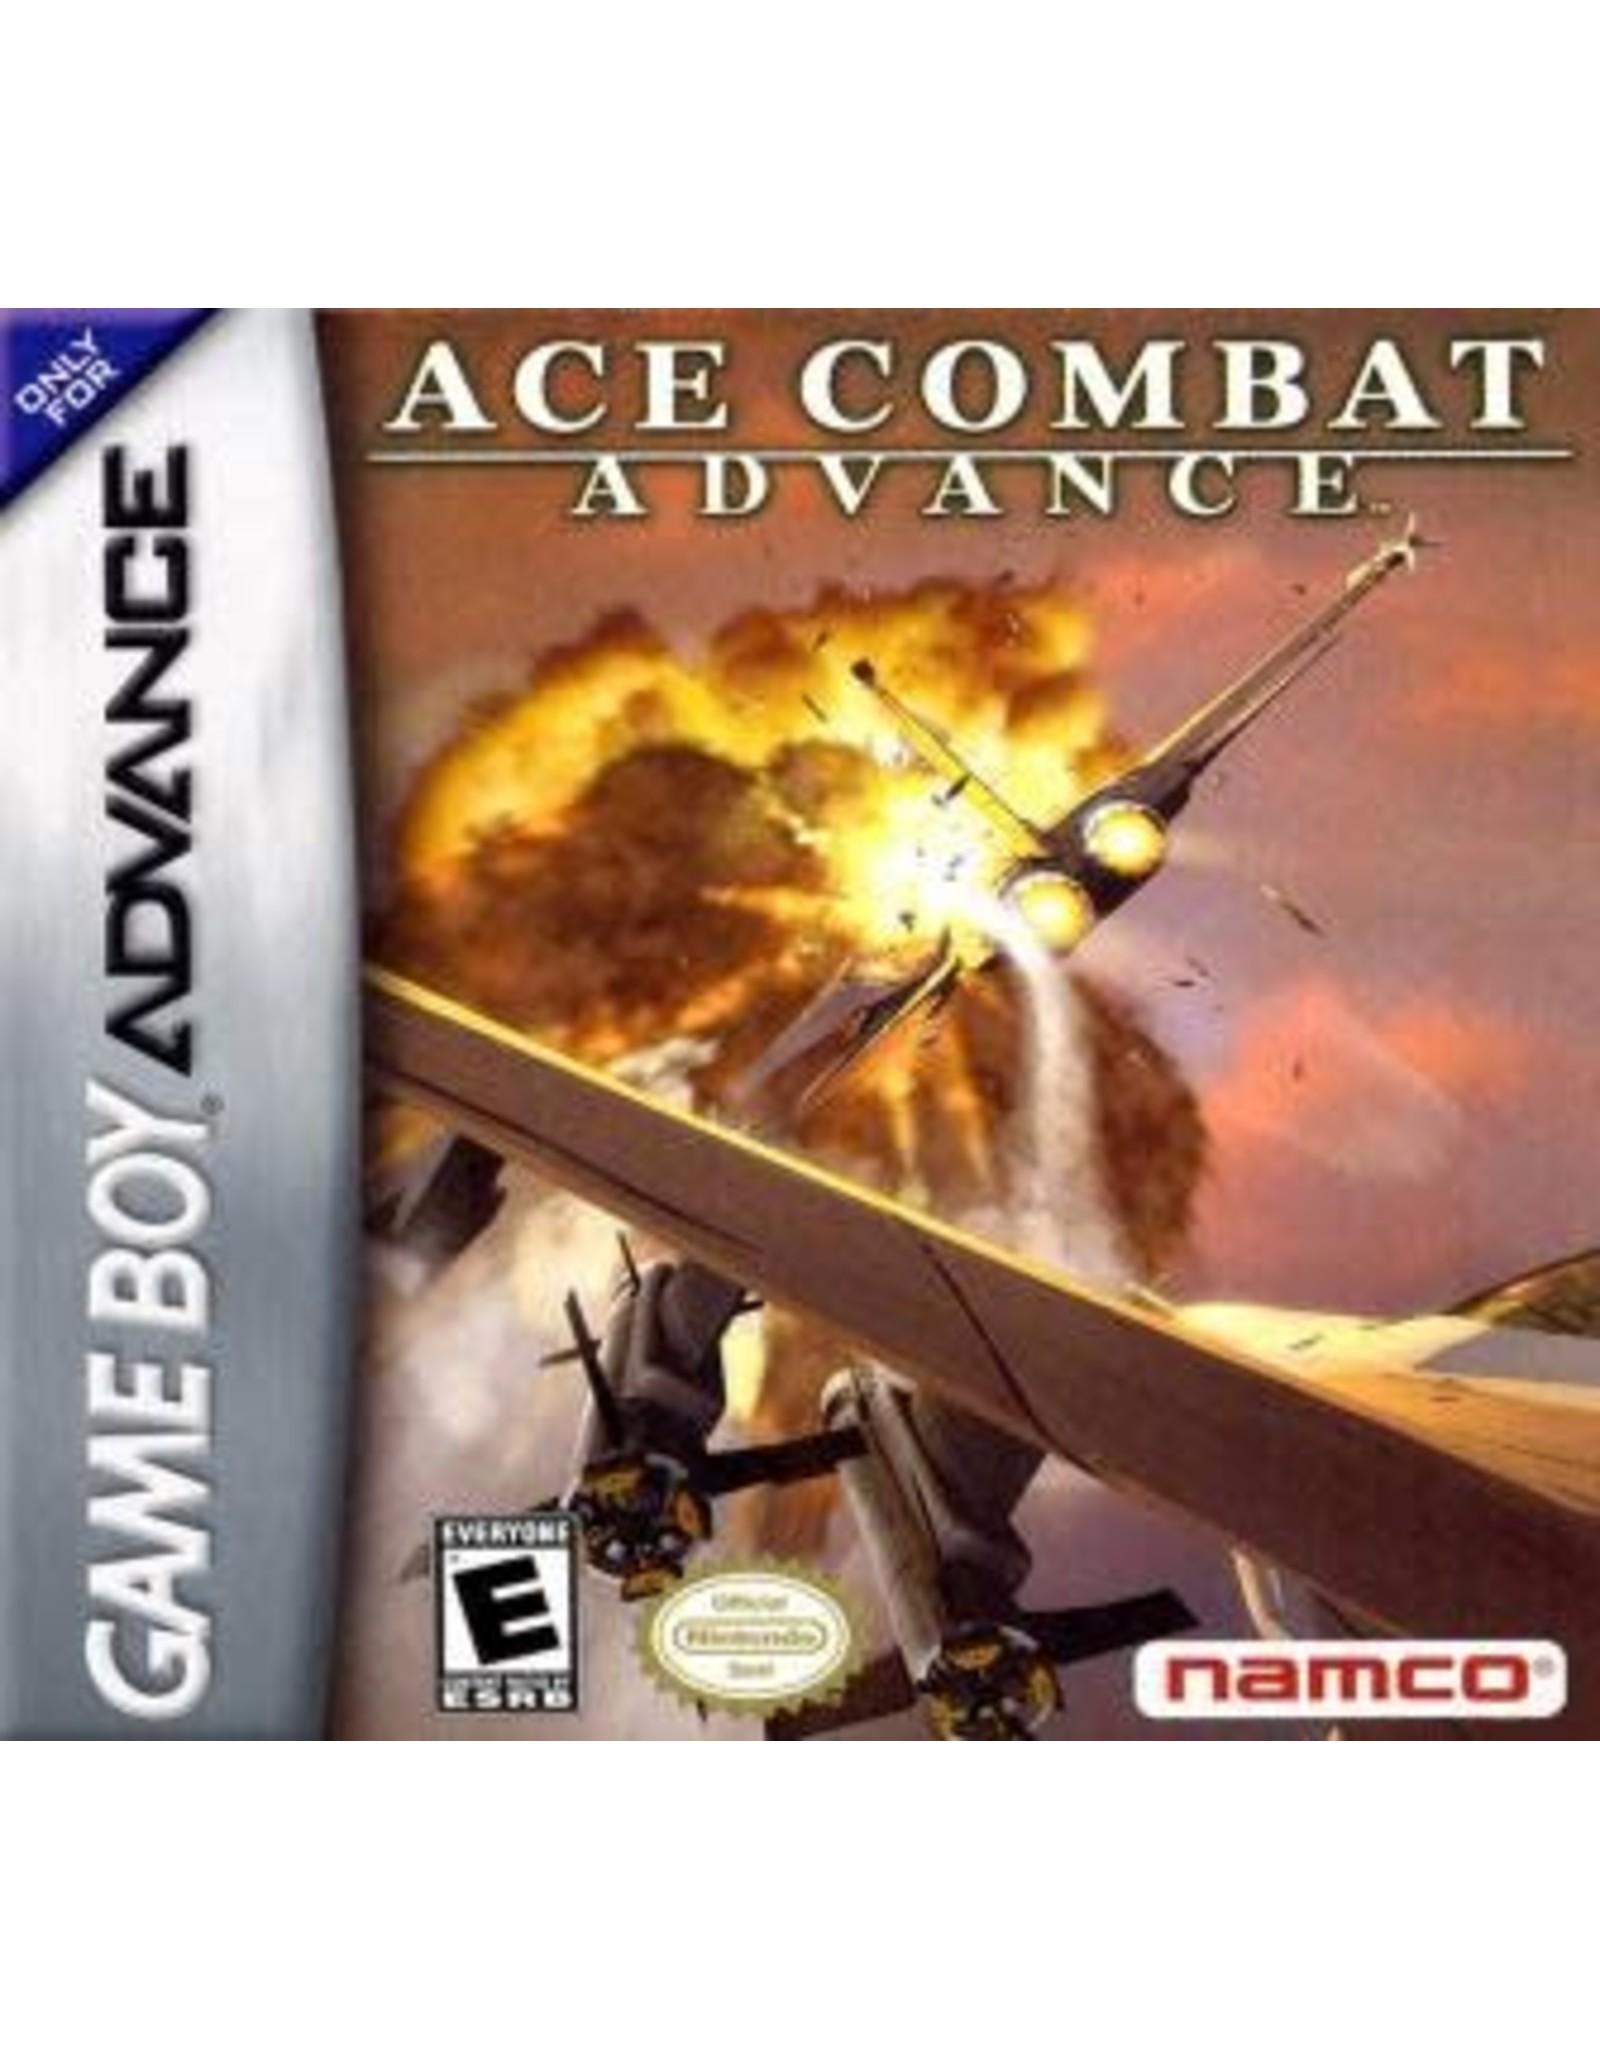 GameBoy Advance Ace Combat Advance (Cart Only)